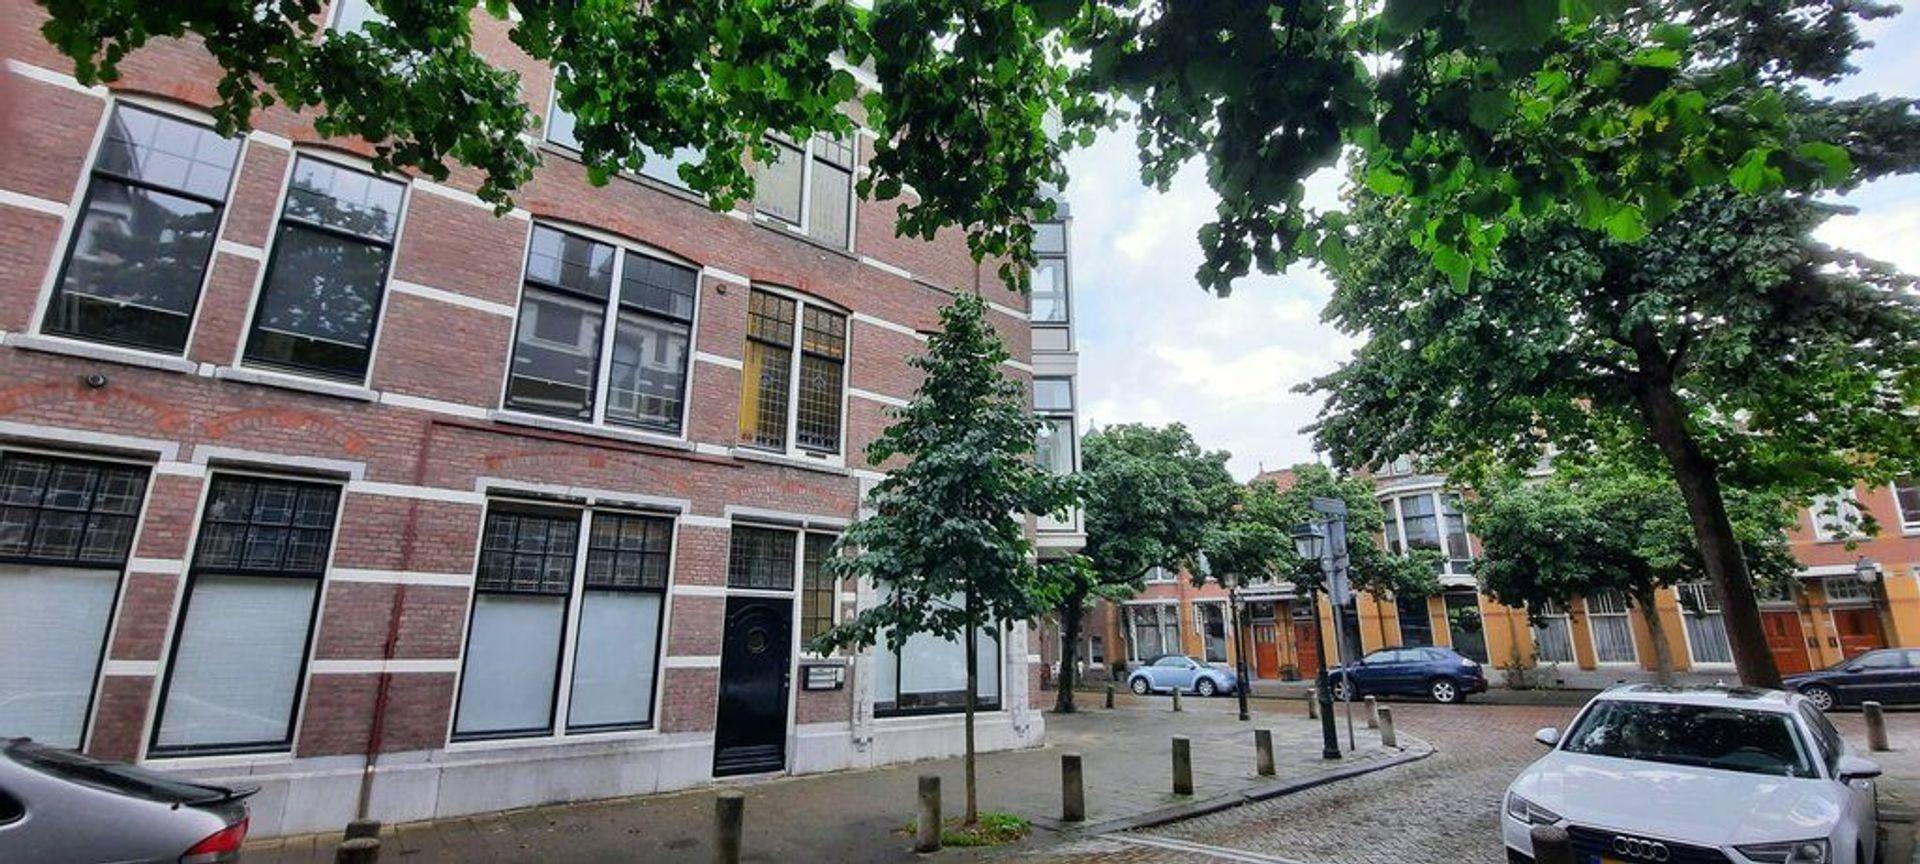 Antonie Duyckstraat 142, Den Haag foto-36